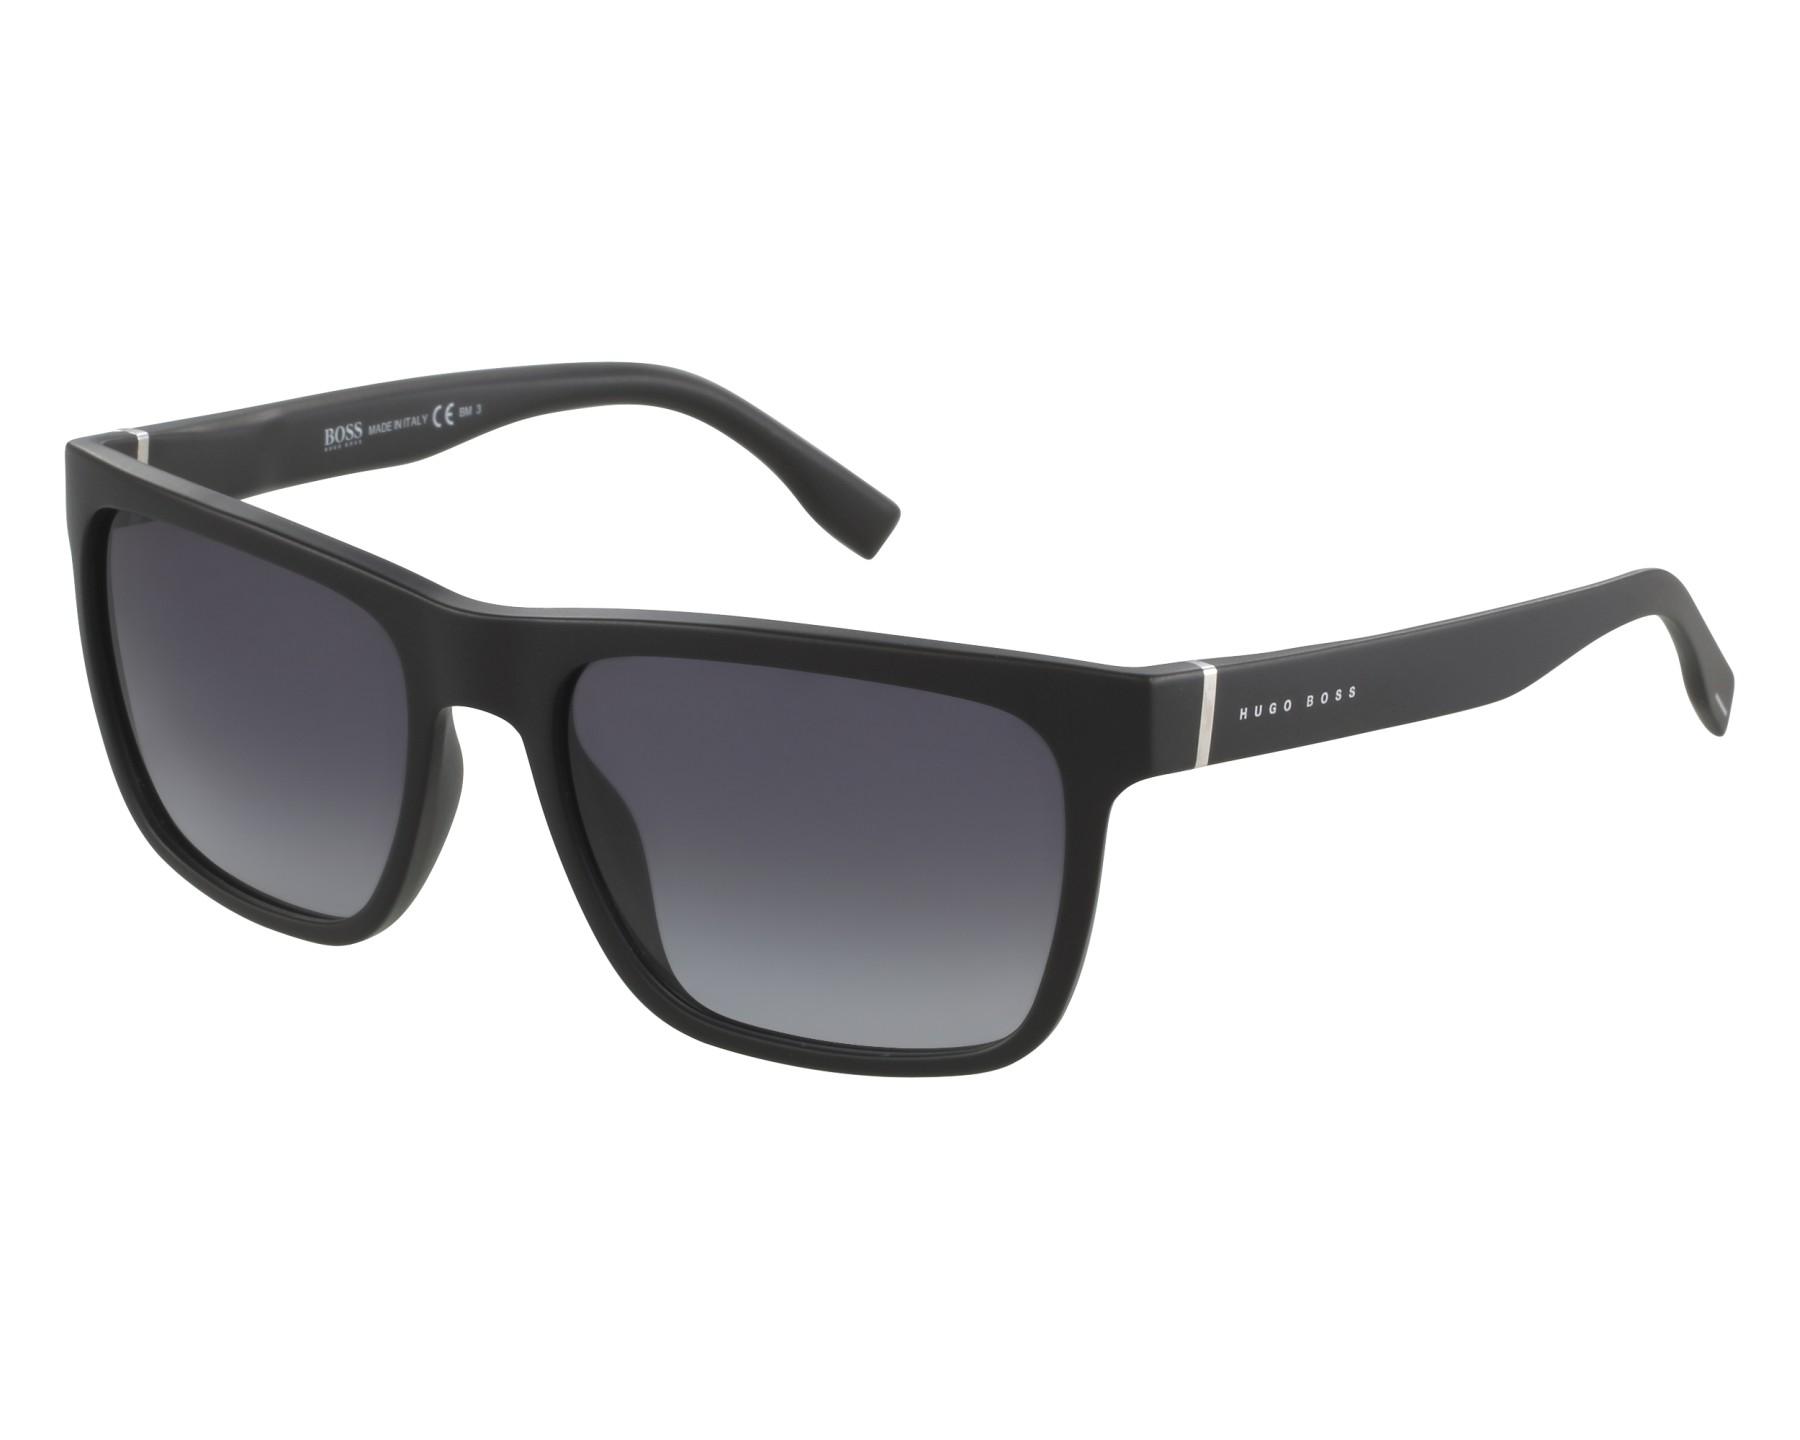 3e153224950fc Sunglasses Hugo Boss BOSS-0727-S 003-9O 56-18 Black front